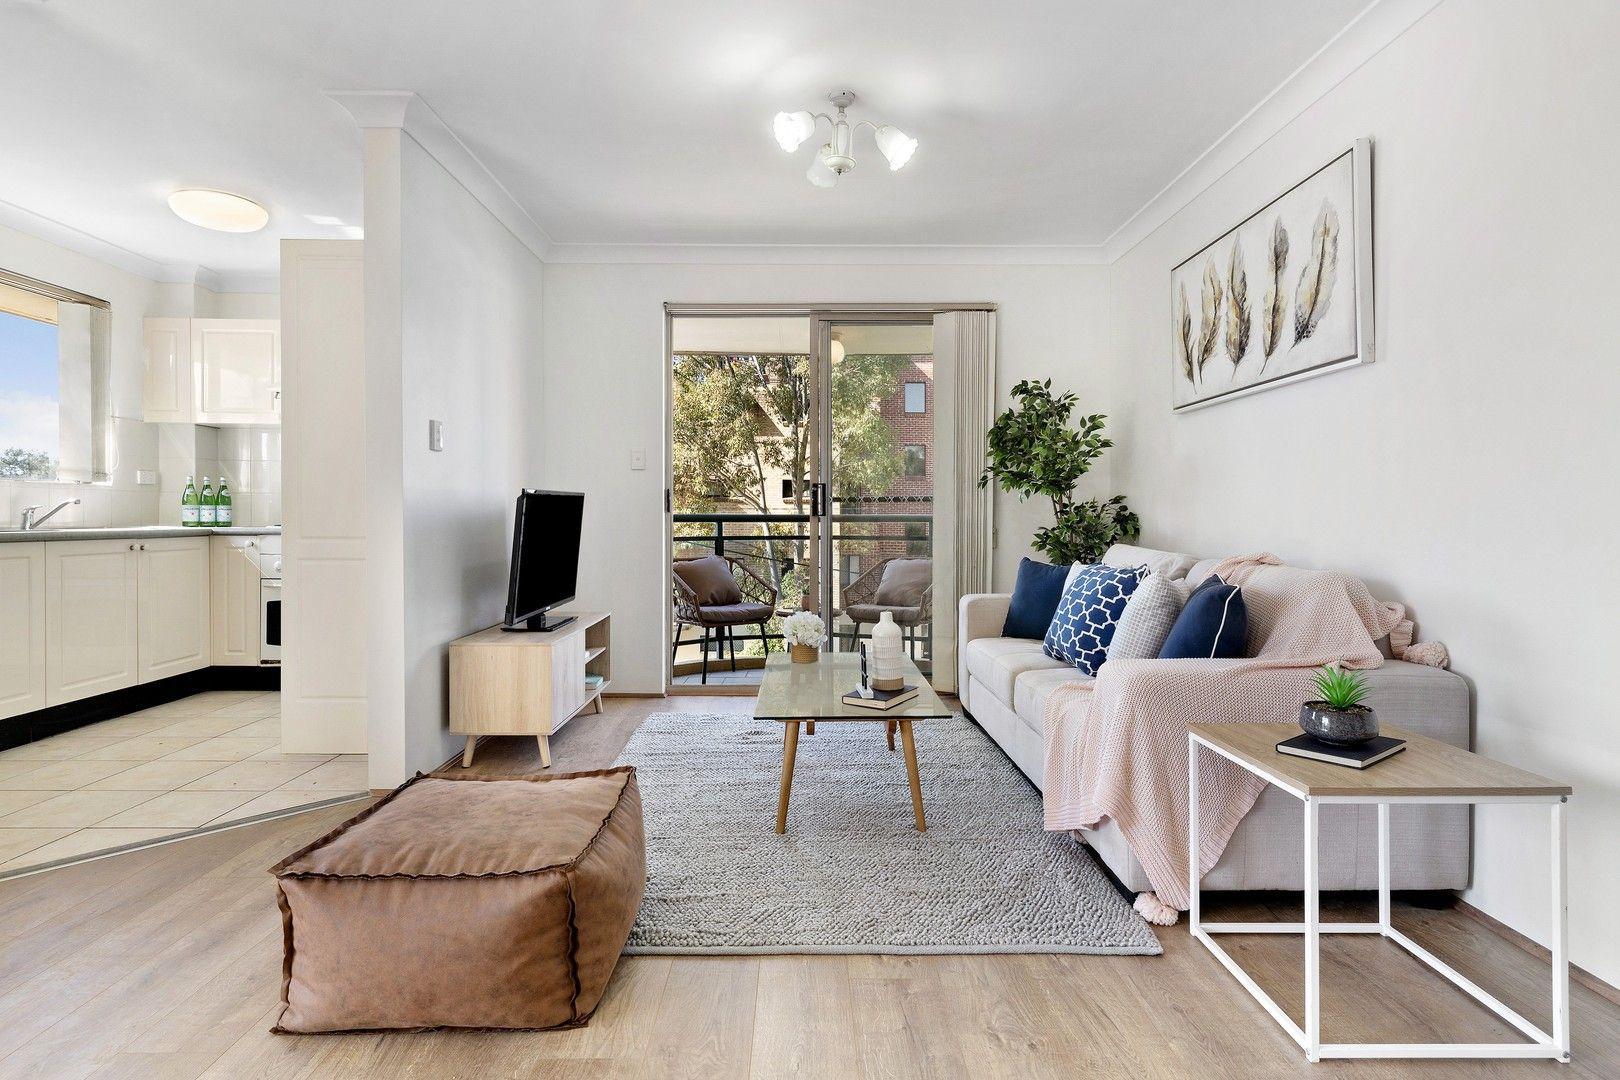 13/8 Catherine Street, Rockdale NSW 2216, Image 0